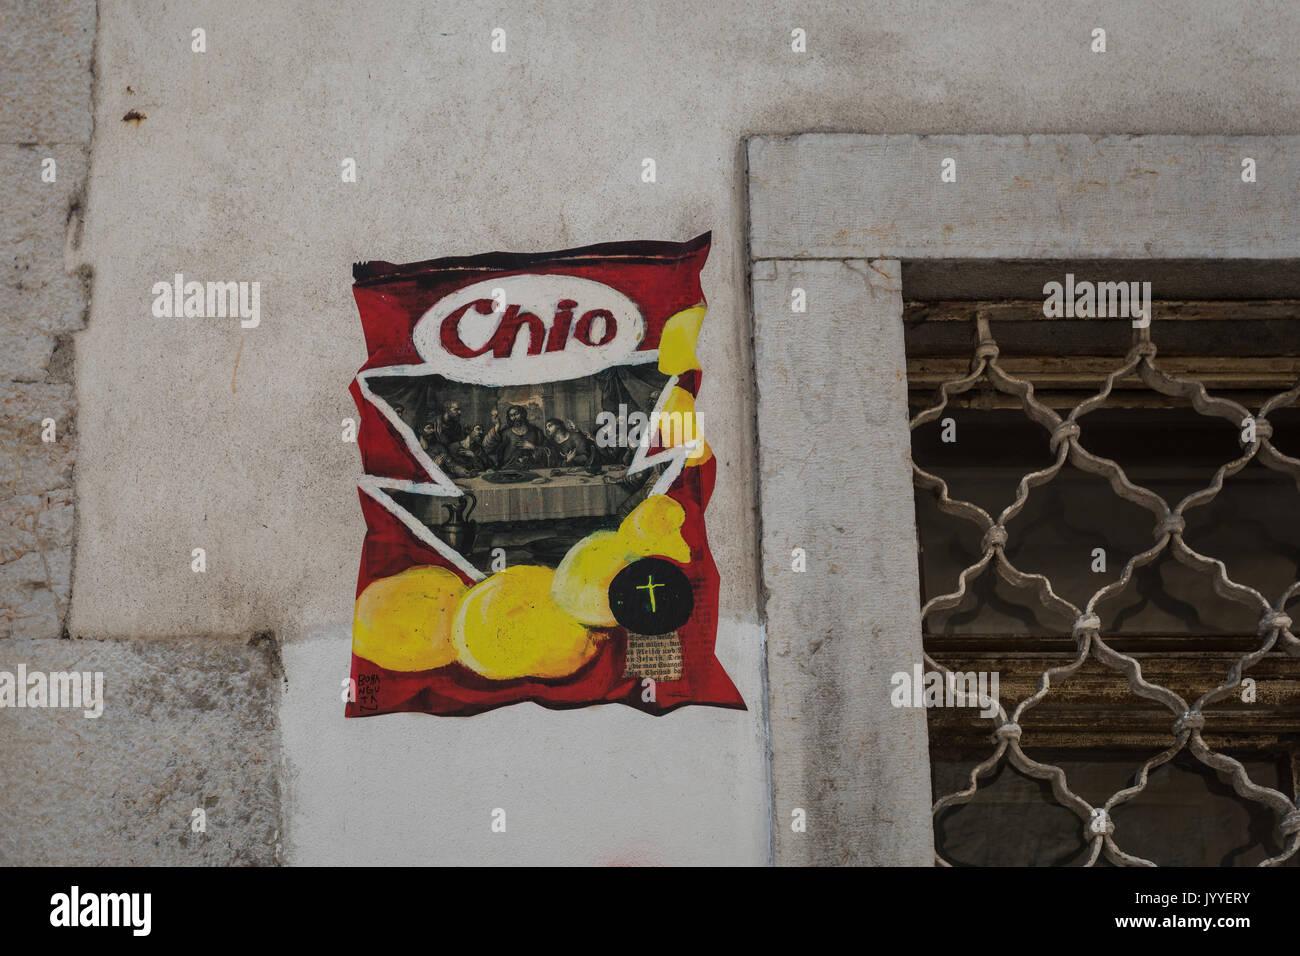 Chio Chips The Last Supper Graffiti Street Art In Ljubljana Stock Photo Alamy